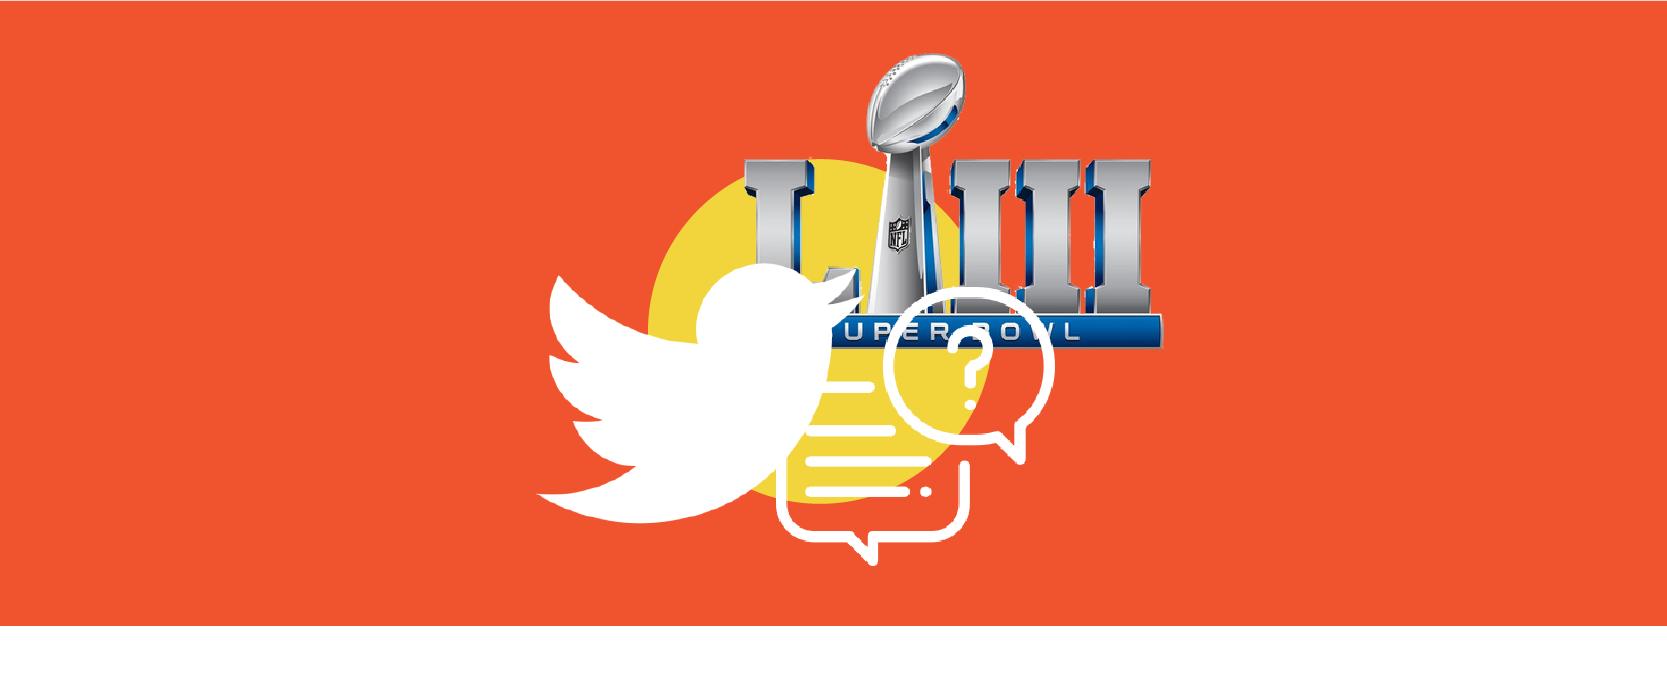 Twitter Super Bowl.png